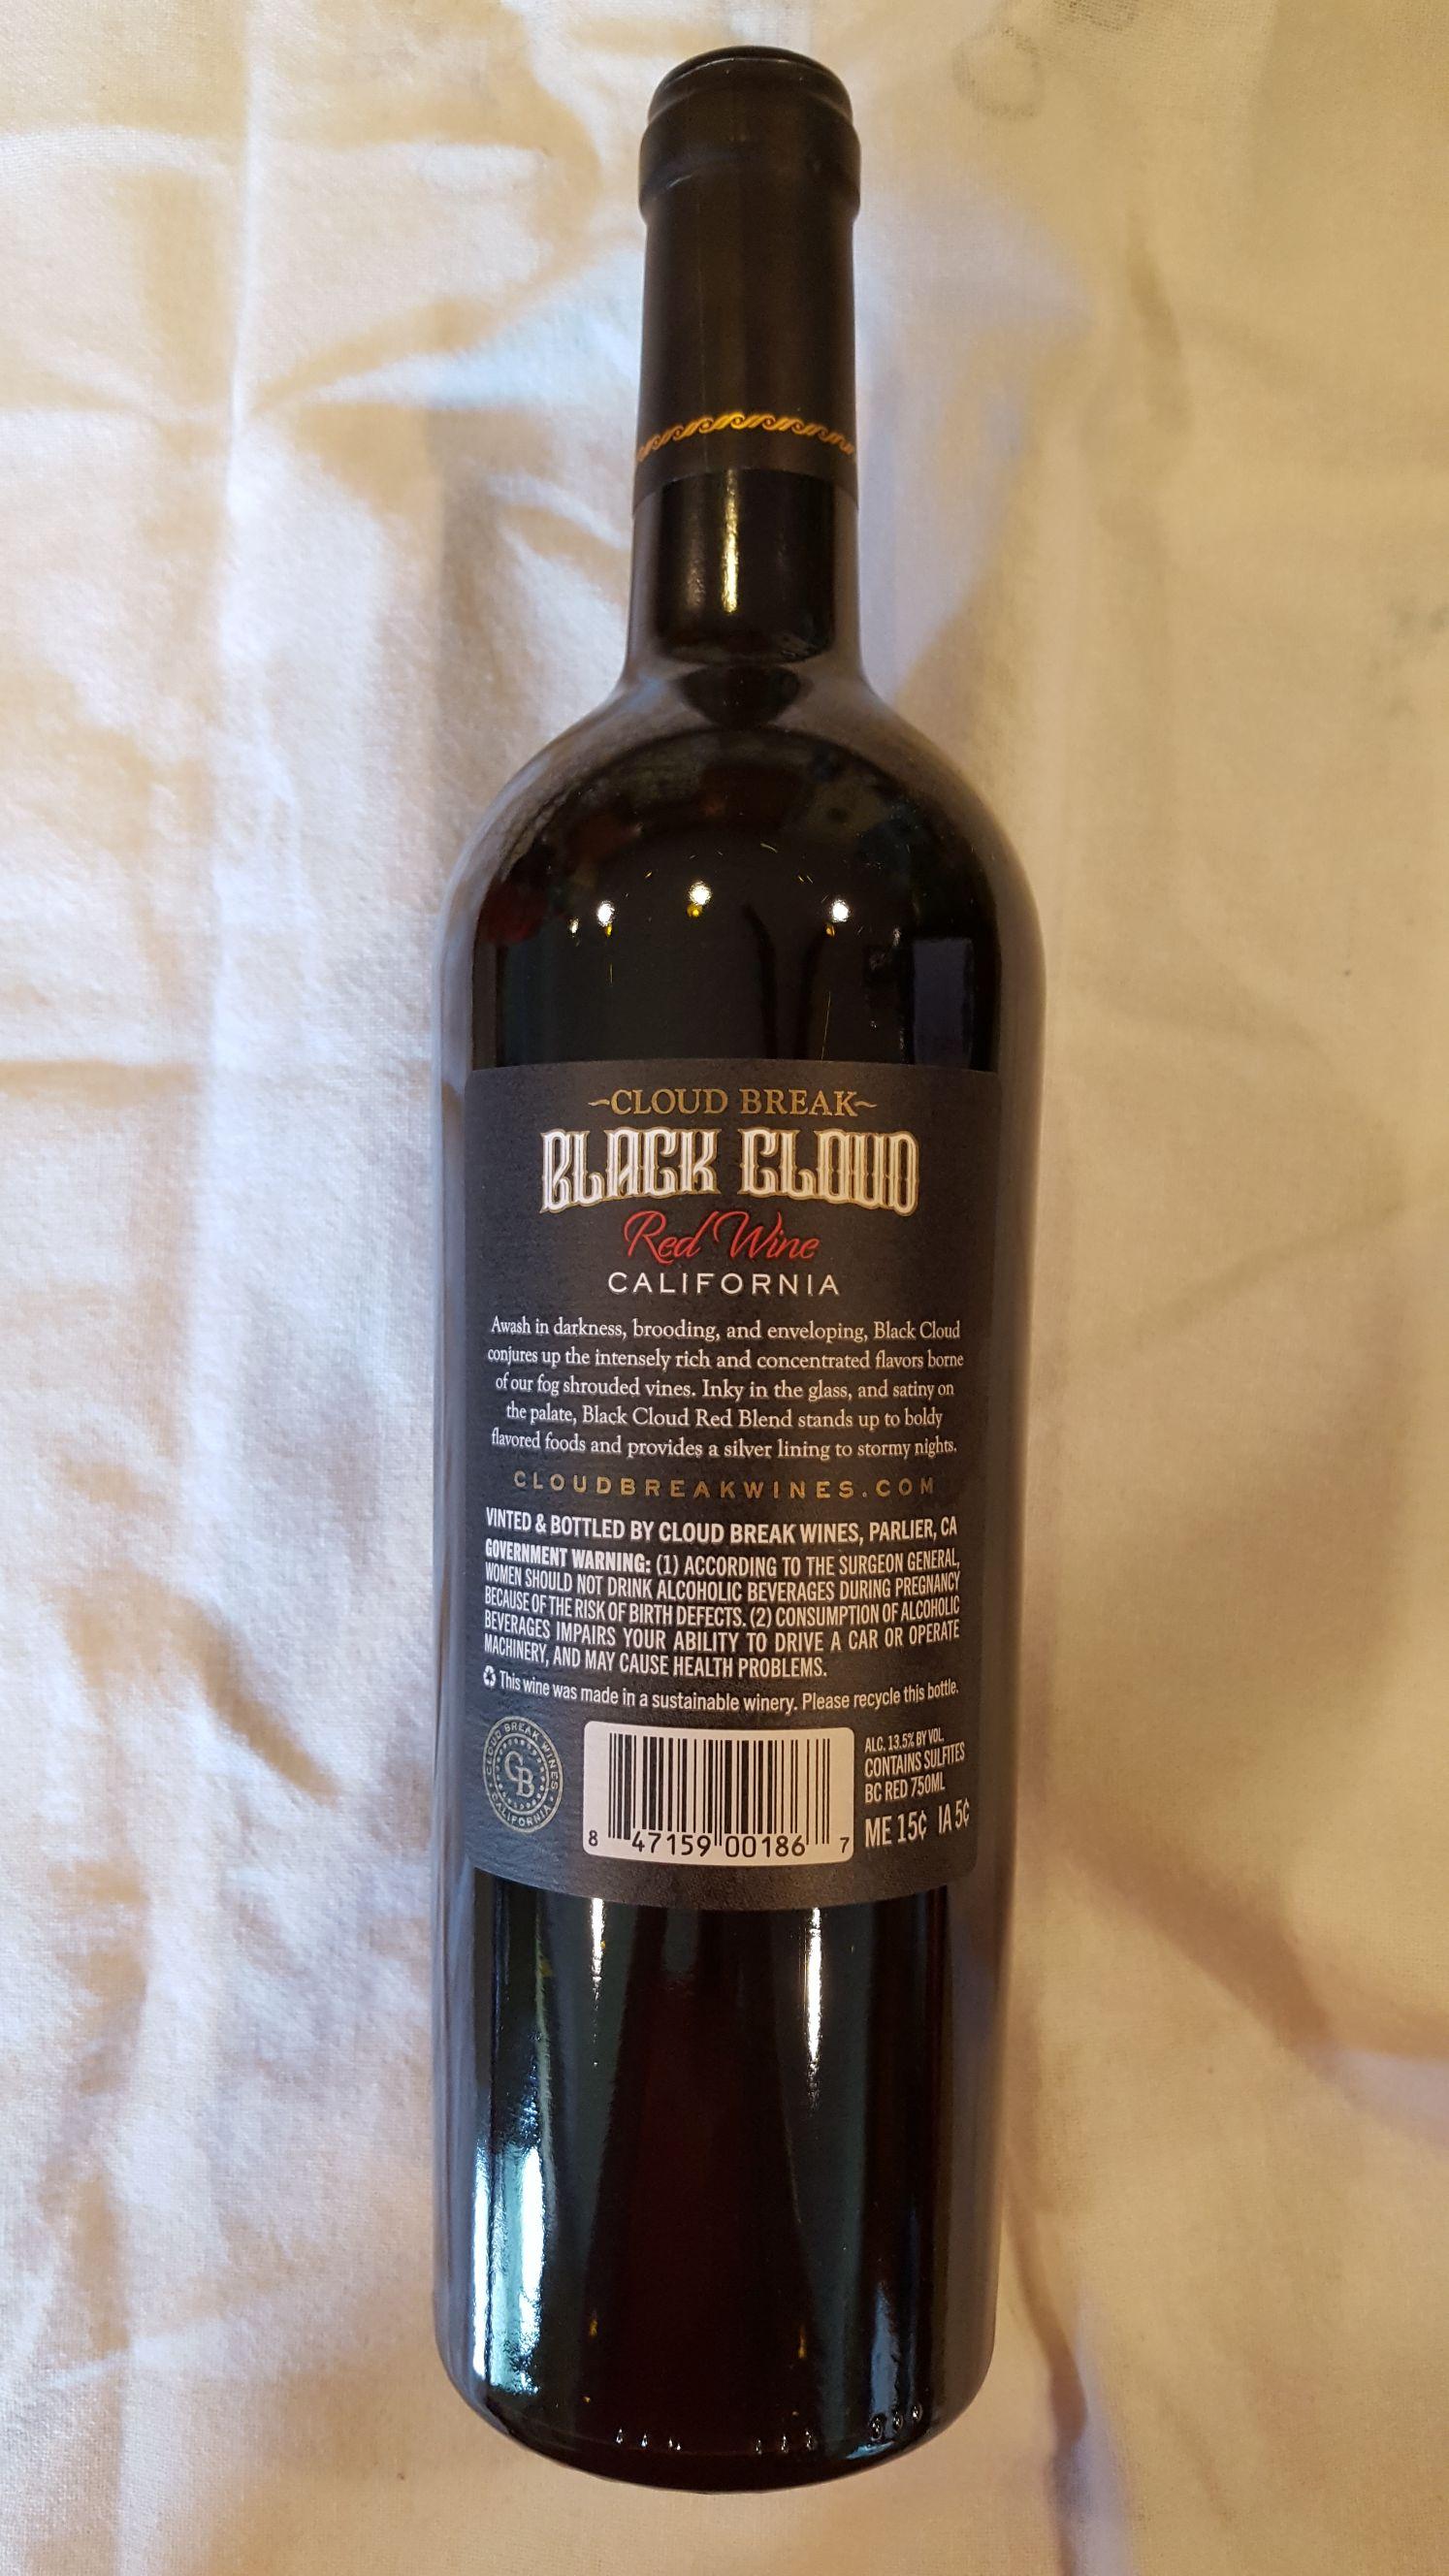 Cloud Break Black Cloud Alcohol - Cloud Break Wines (Red Blend) back image (back cover, second image)